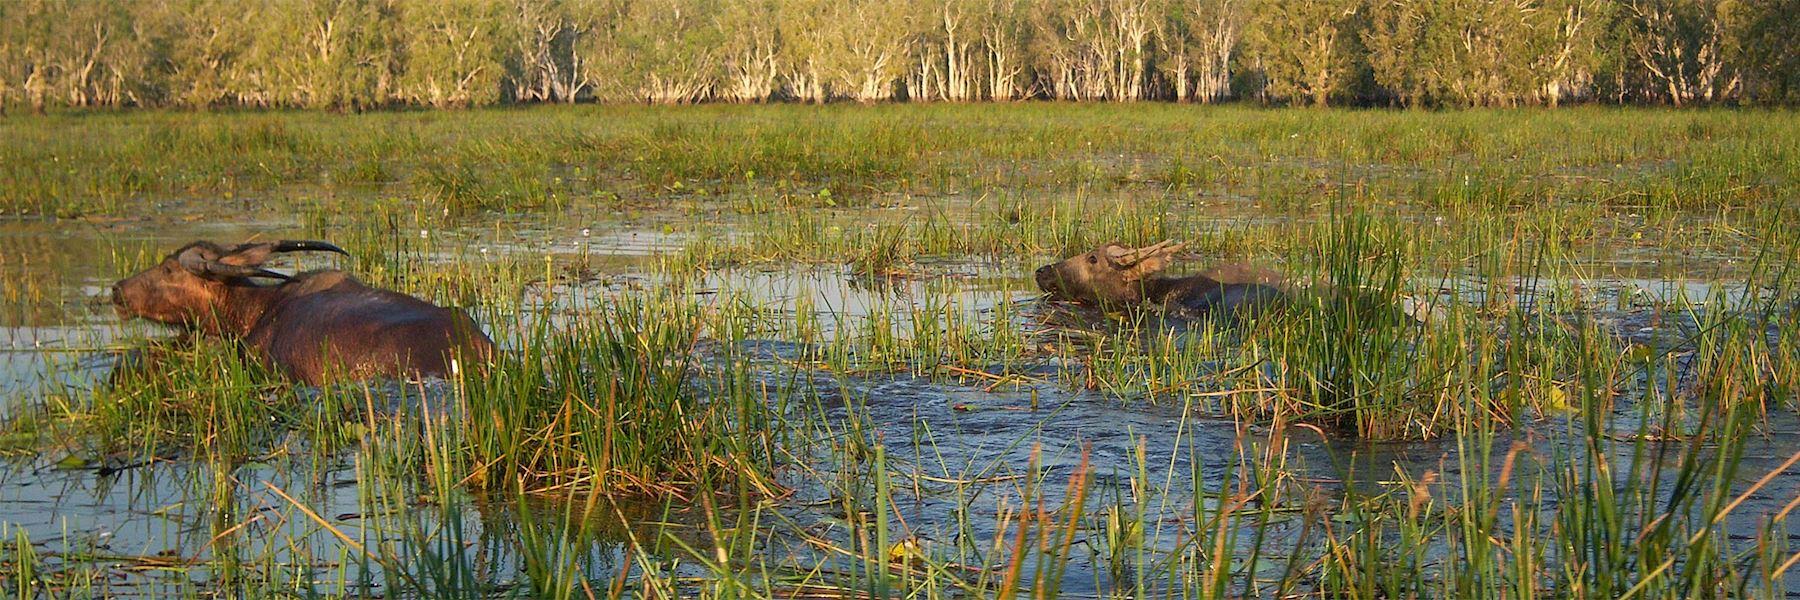 Visit Bamurru Plains, Australia